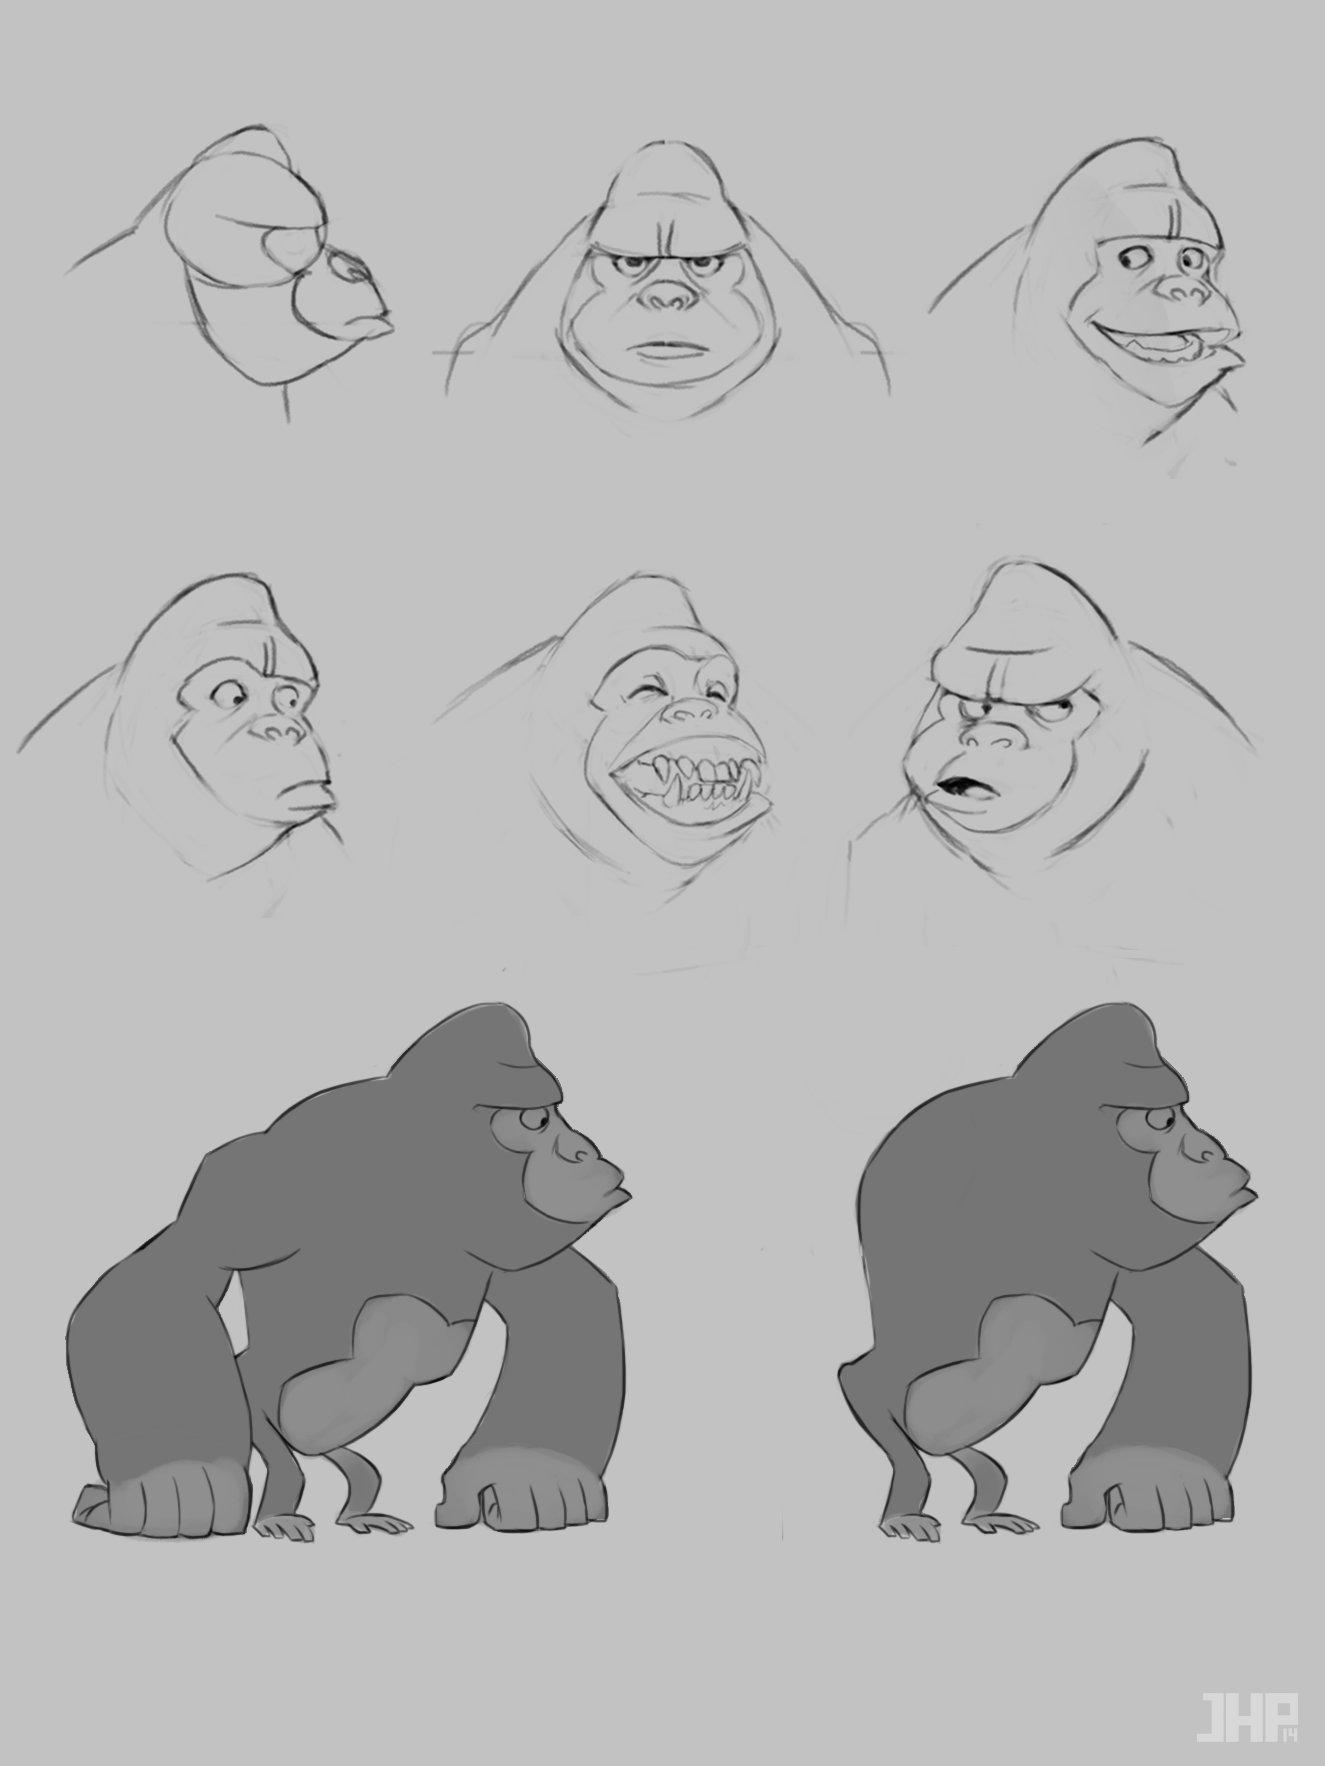 Joao henrique pacheco gorila 2